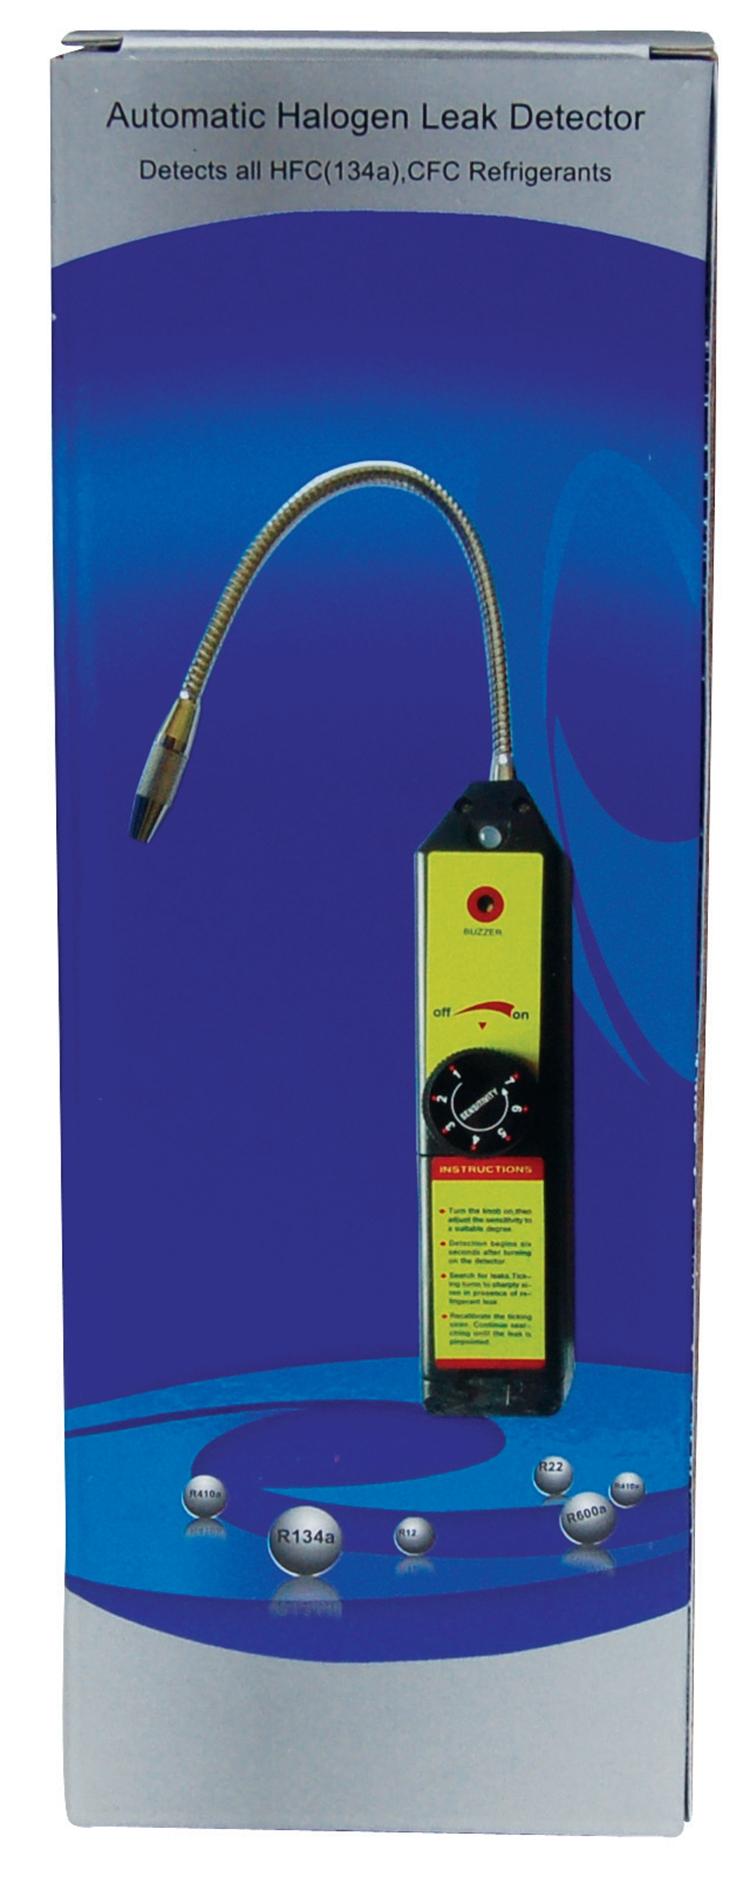 freon leak detector - Coowor com